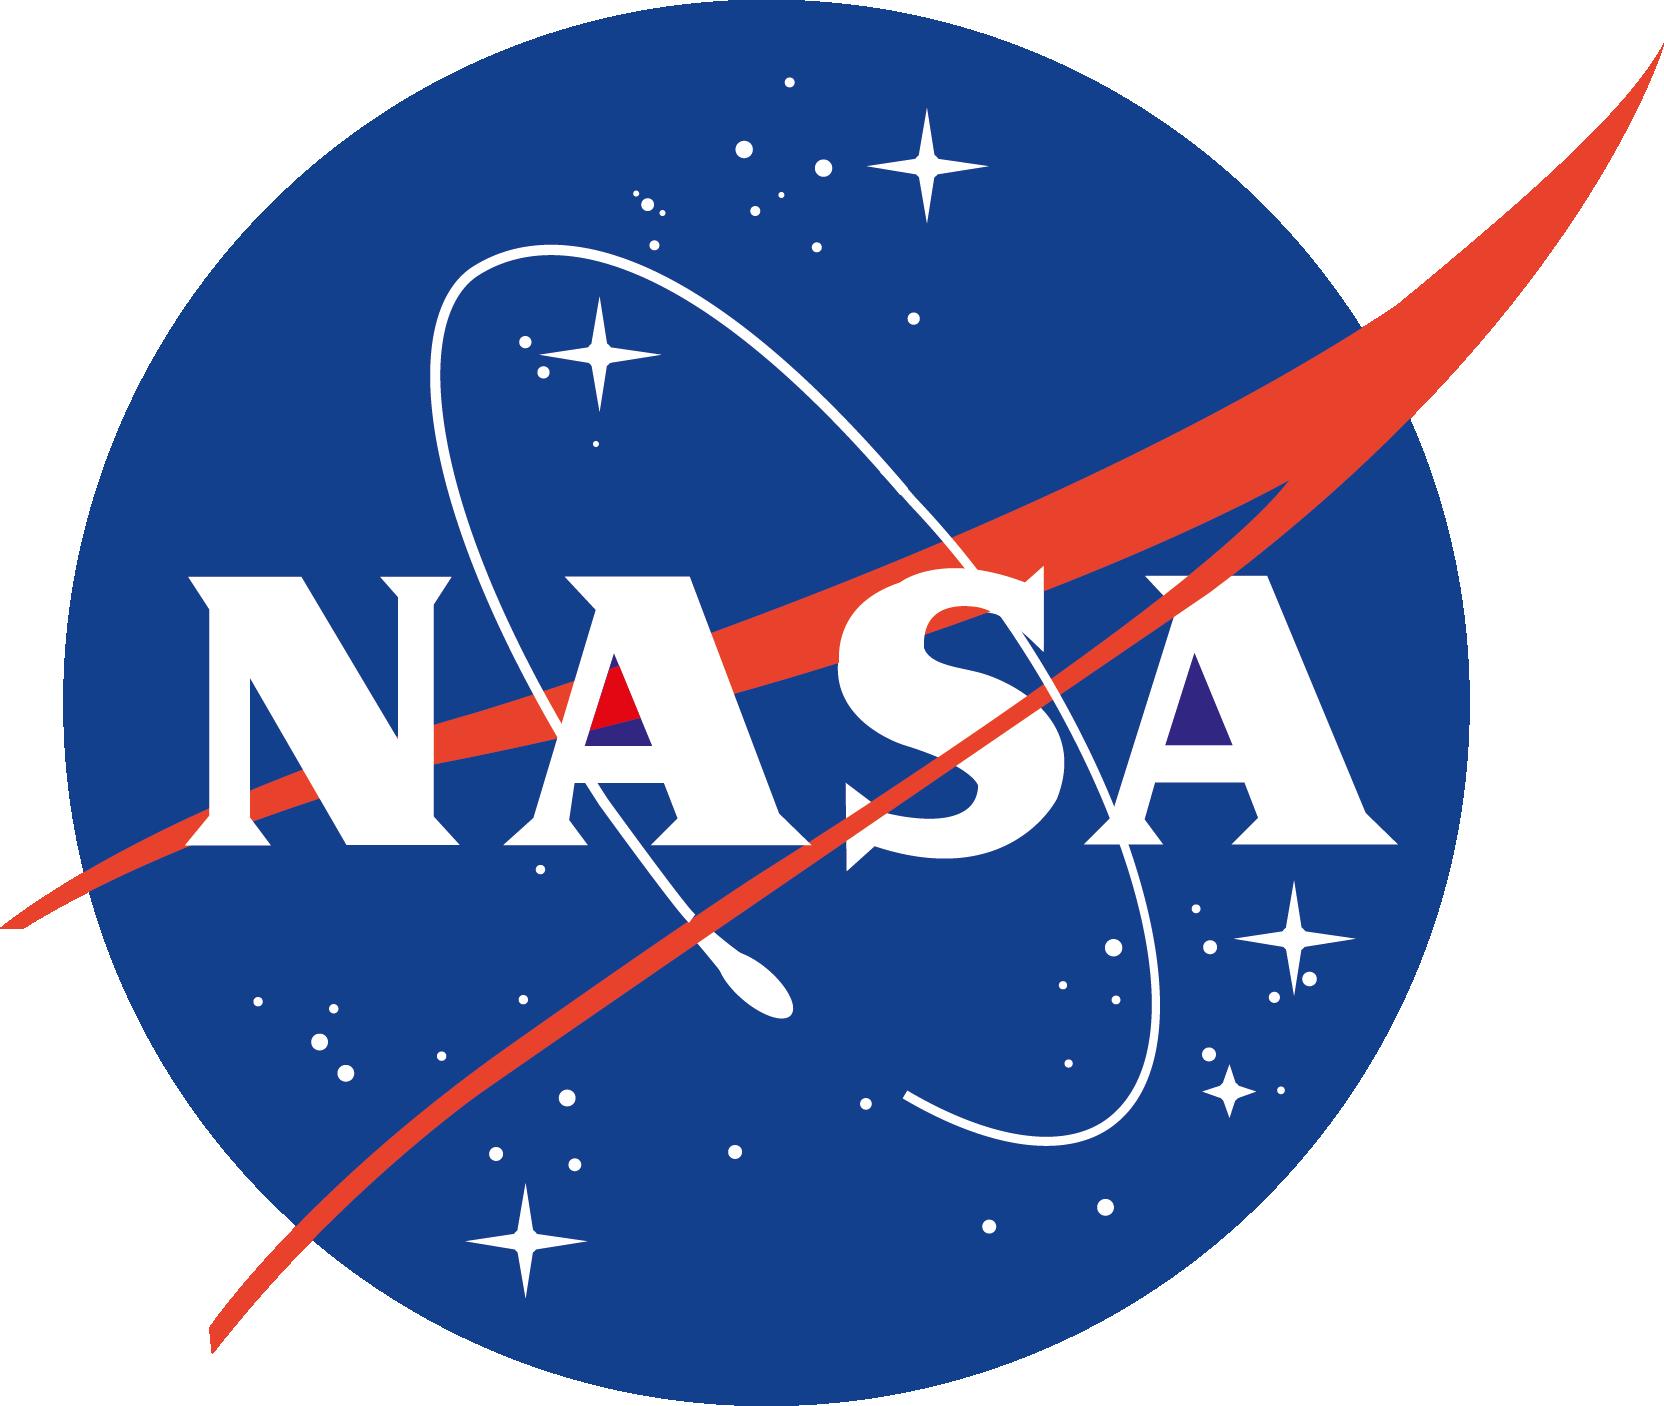 Nasa Logo Png Transparent Nasa Logo Png Images